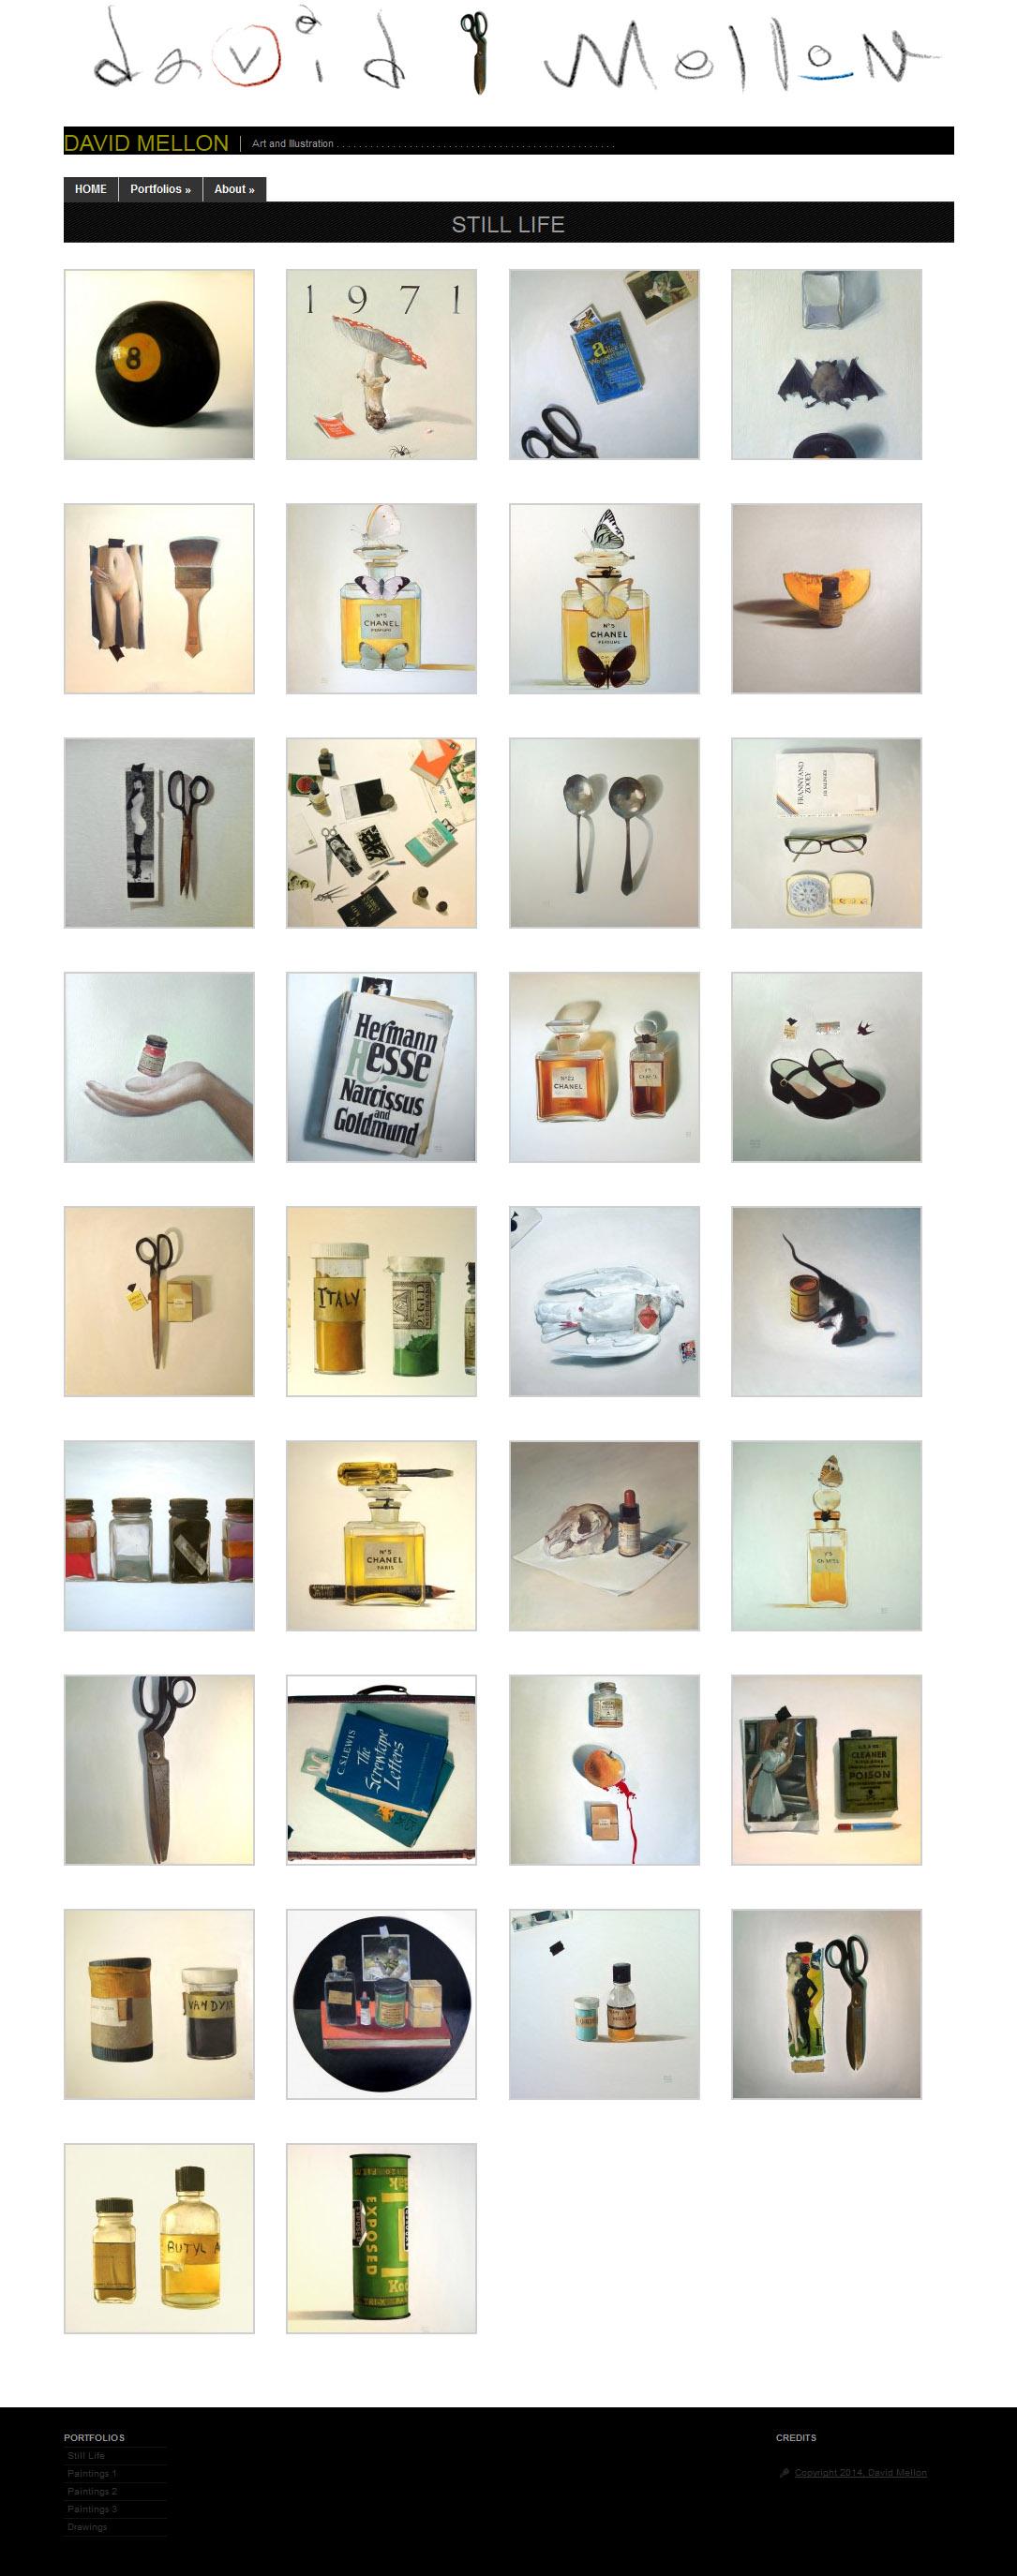 David Mellon Artist Portfolio Web Design and Implementation